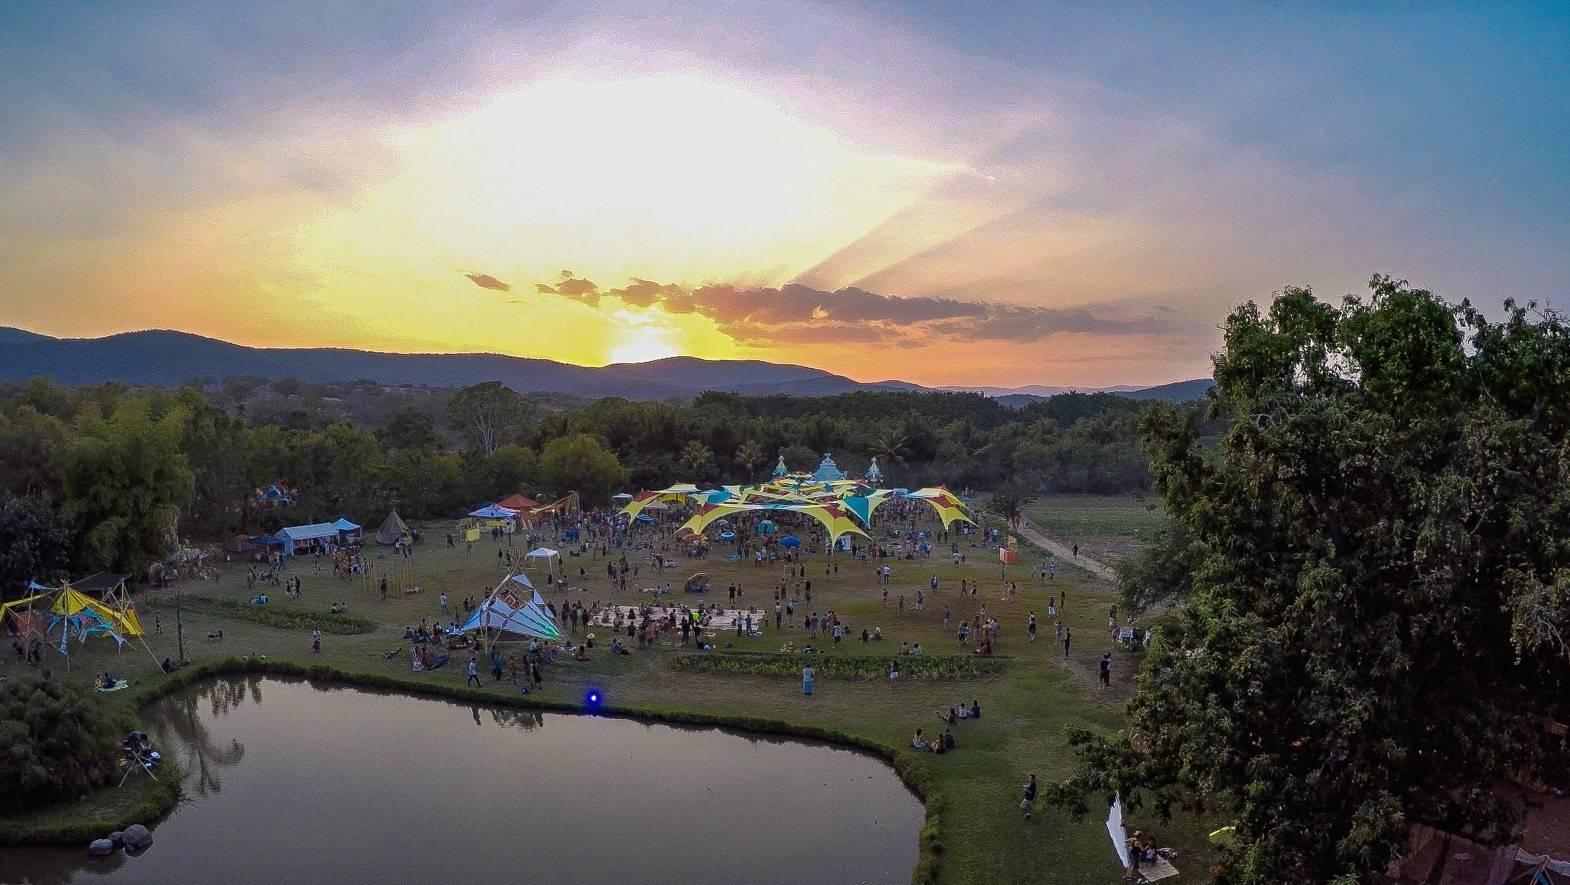 ometeotl-festival-2016_emilio-ramos